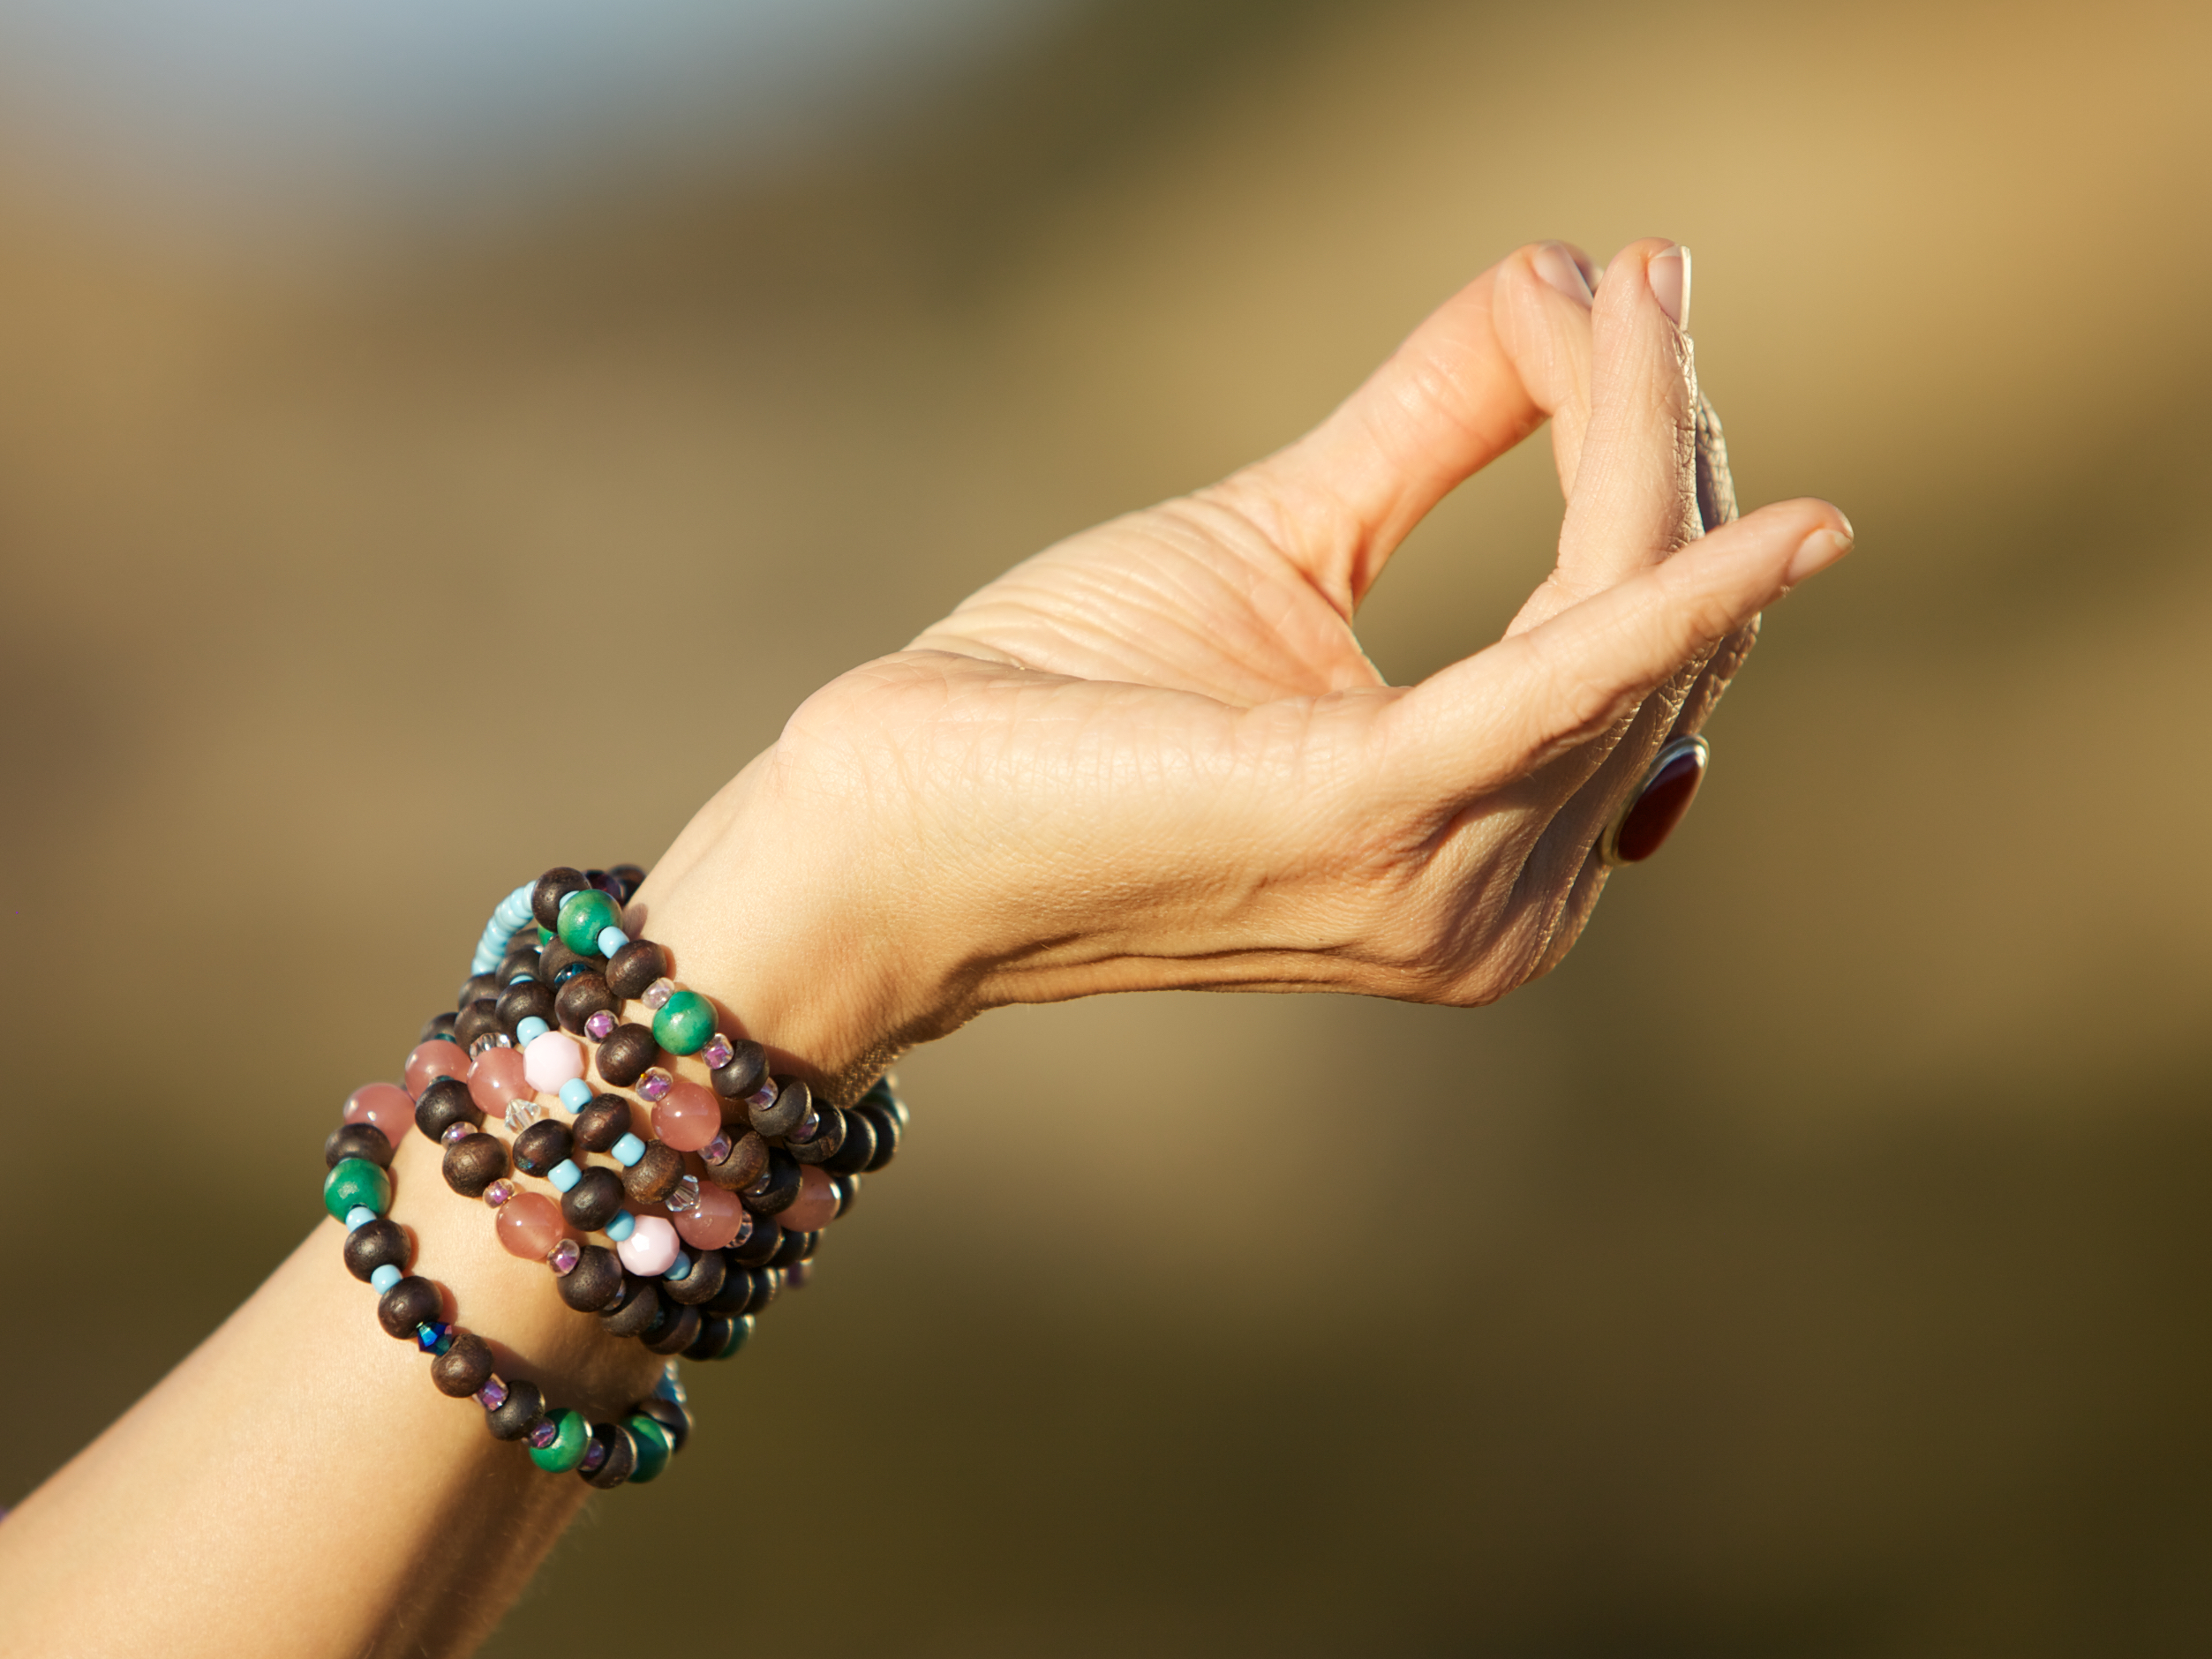 Jeanne Heileman chin mudra mala beads yoga meditation